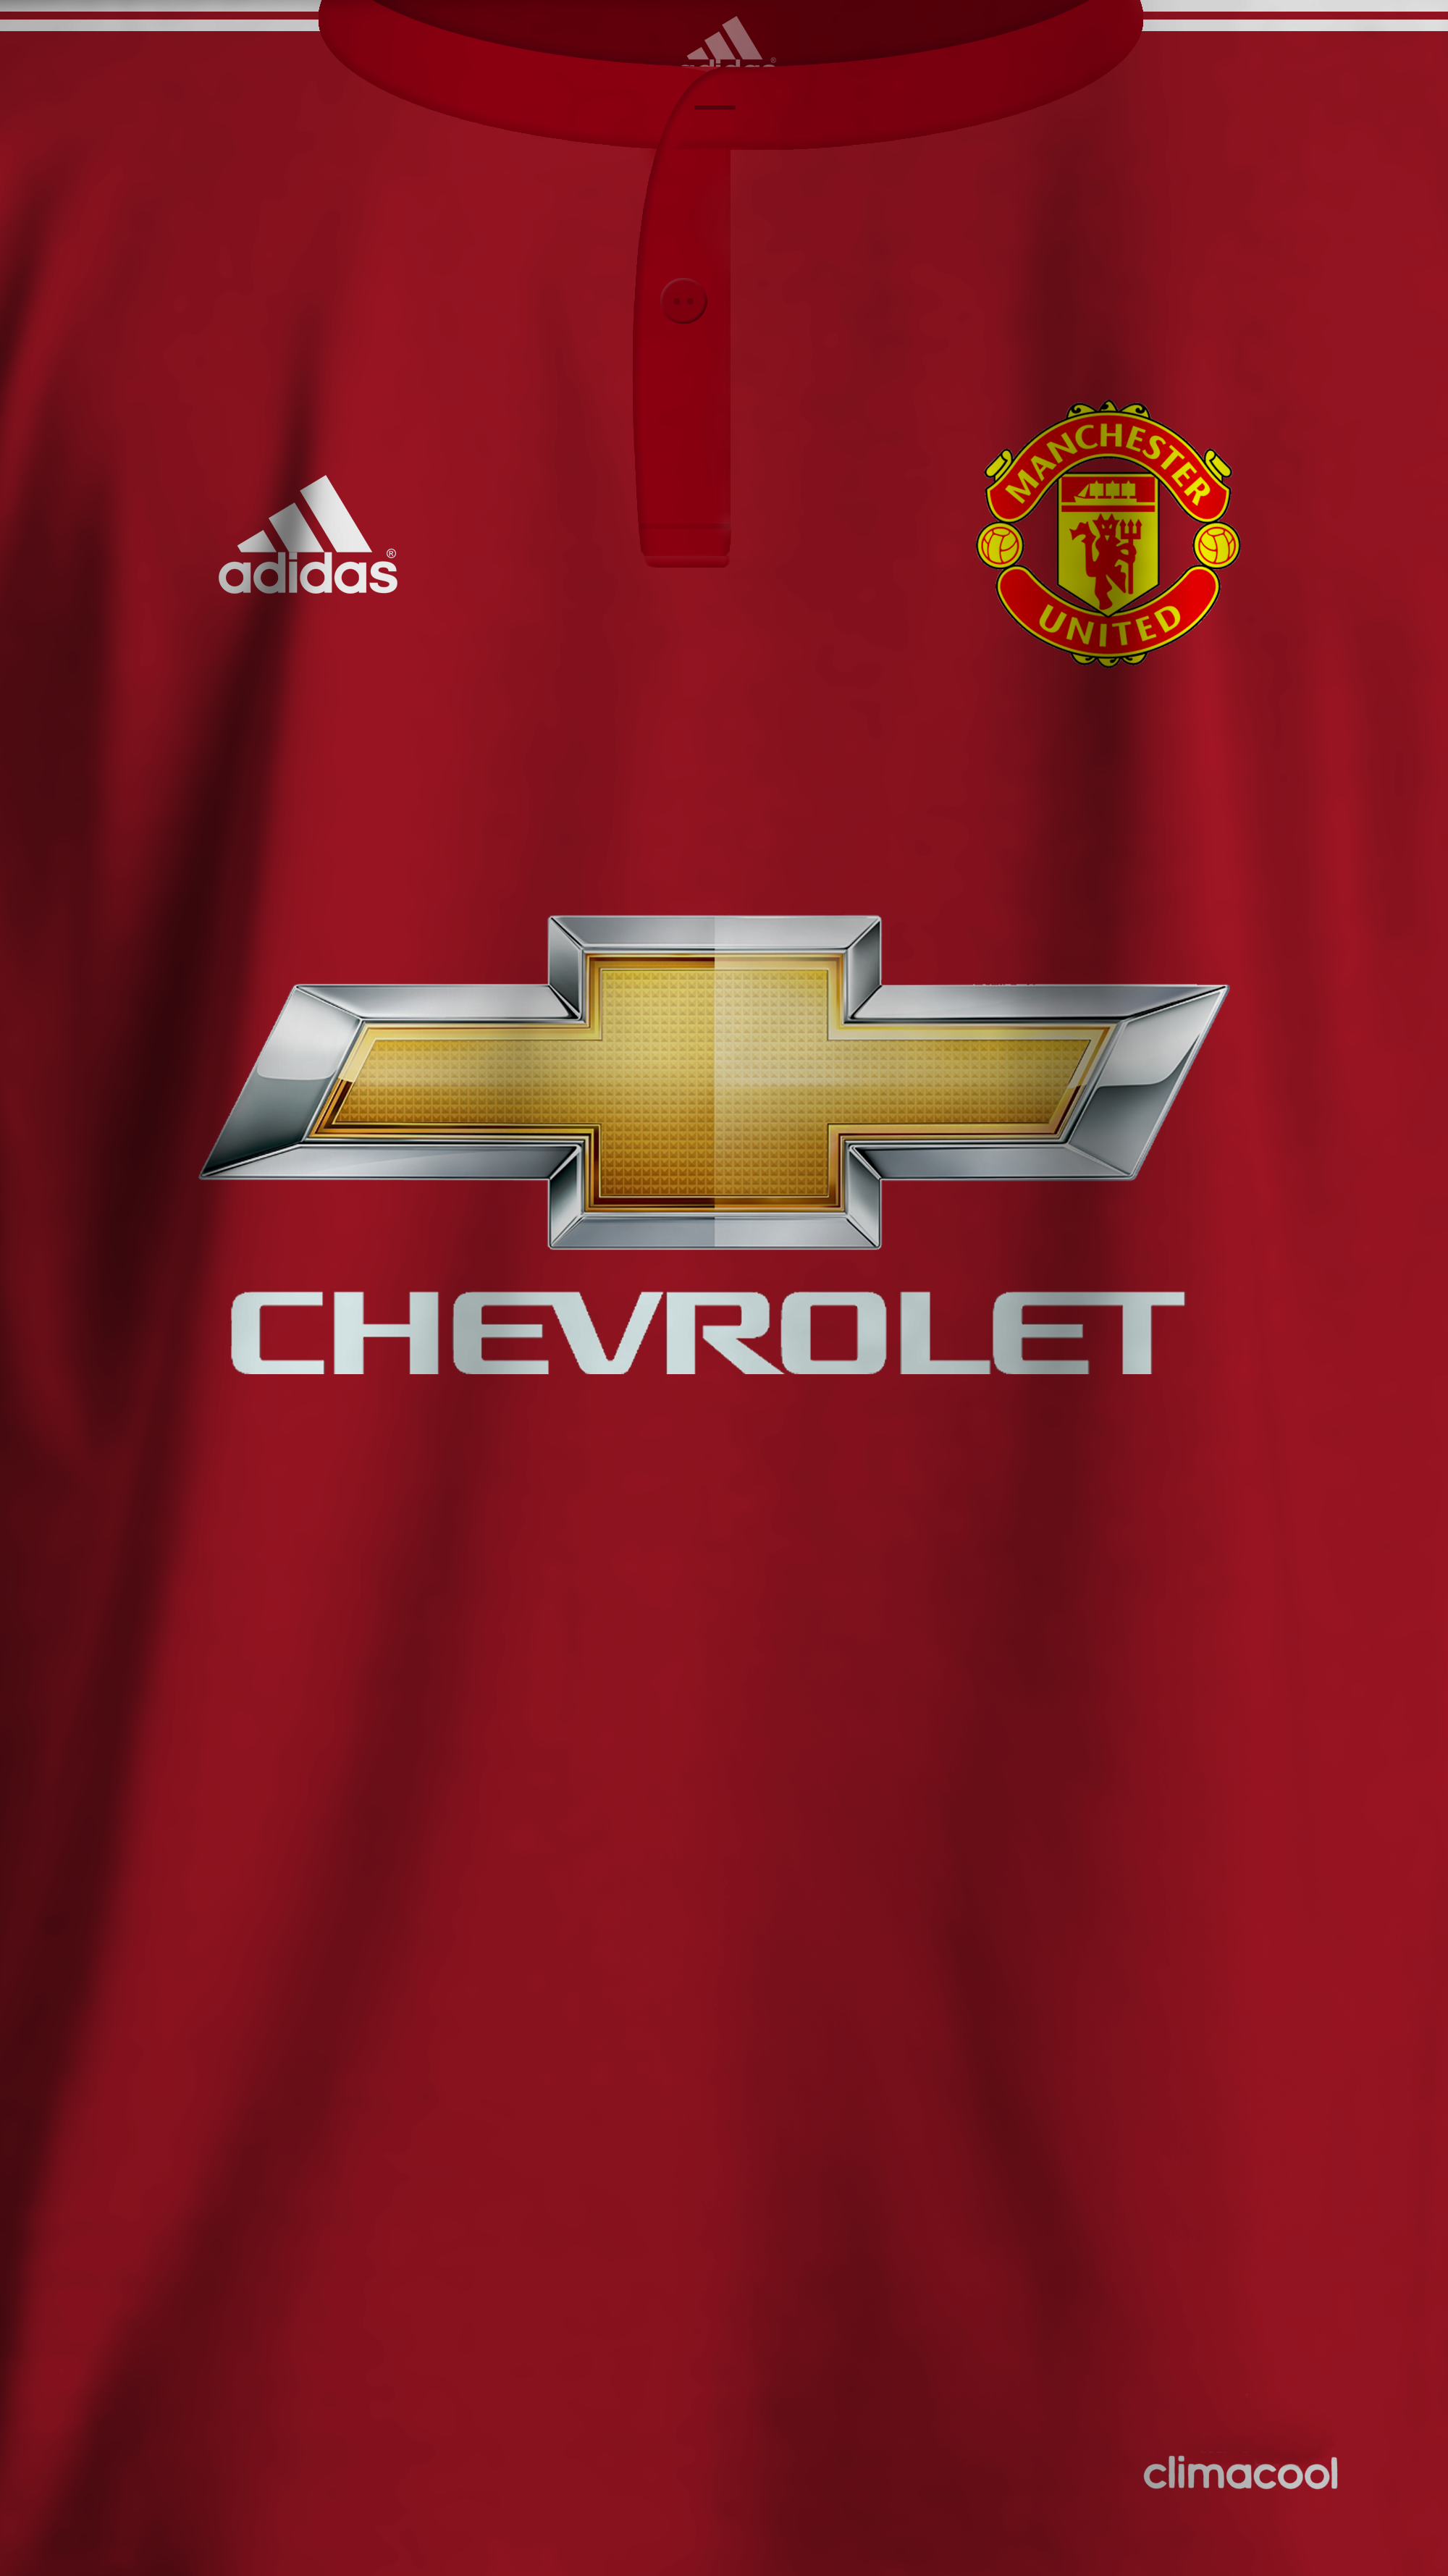 4632255994 Png 716392 2 000 3 558 Pixels Manchester United Wallpaper Manchester United Logo Manchester United Football